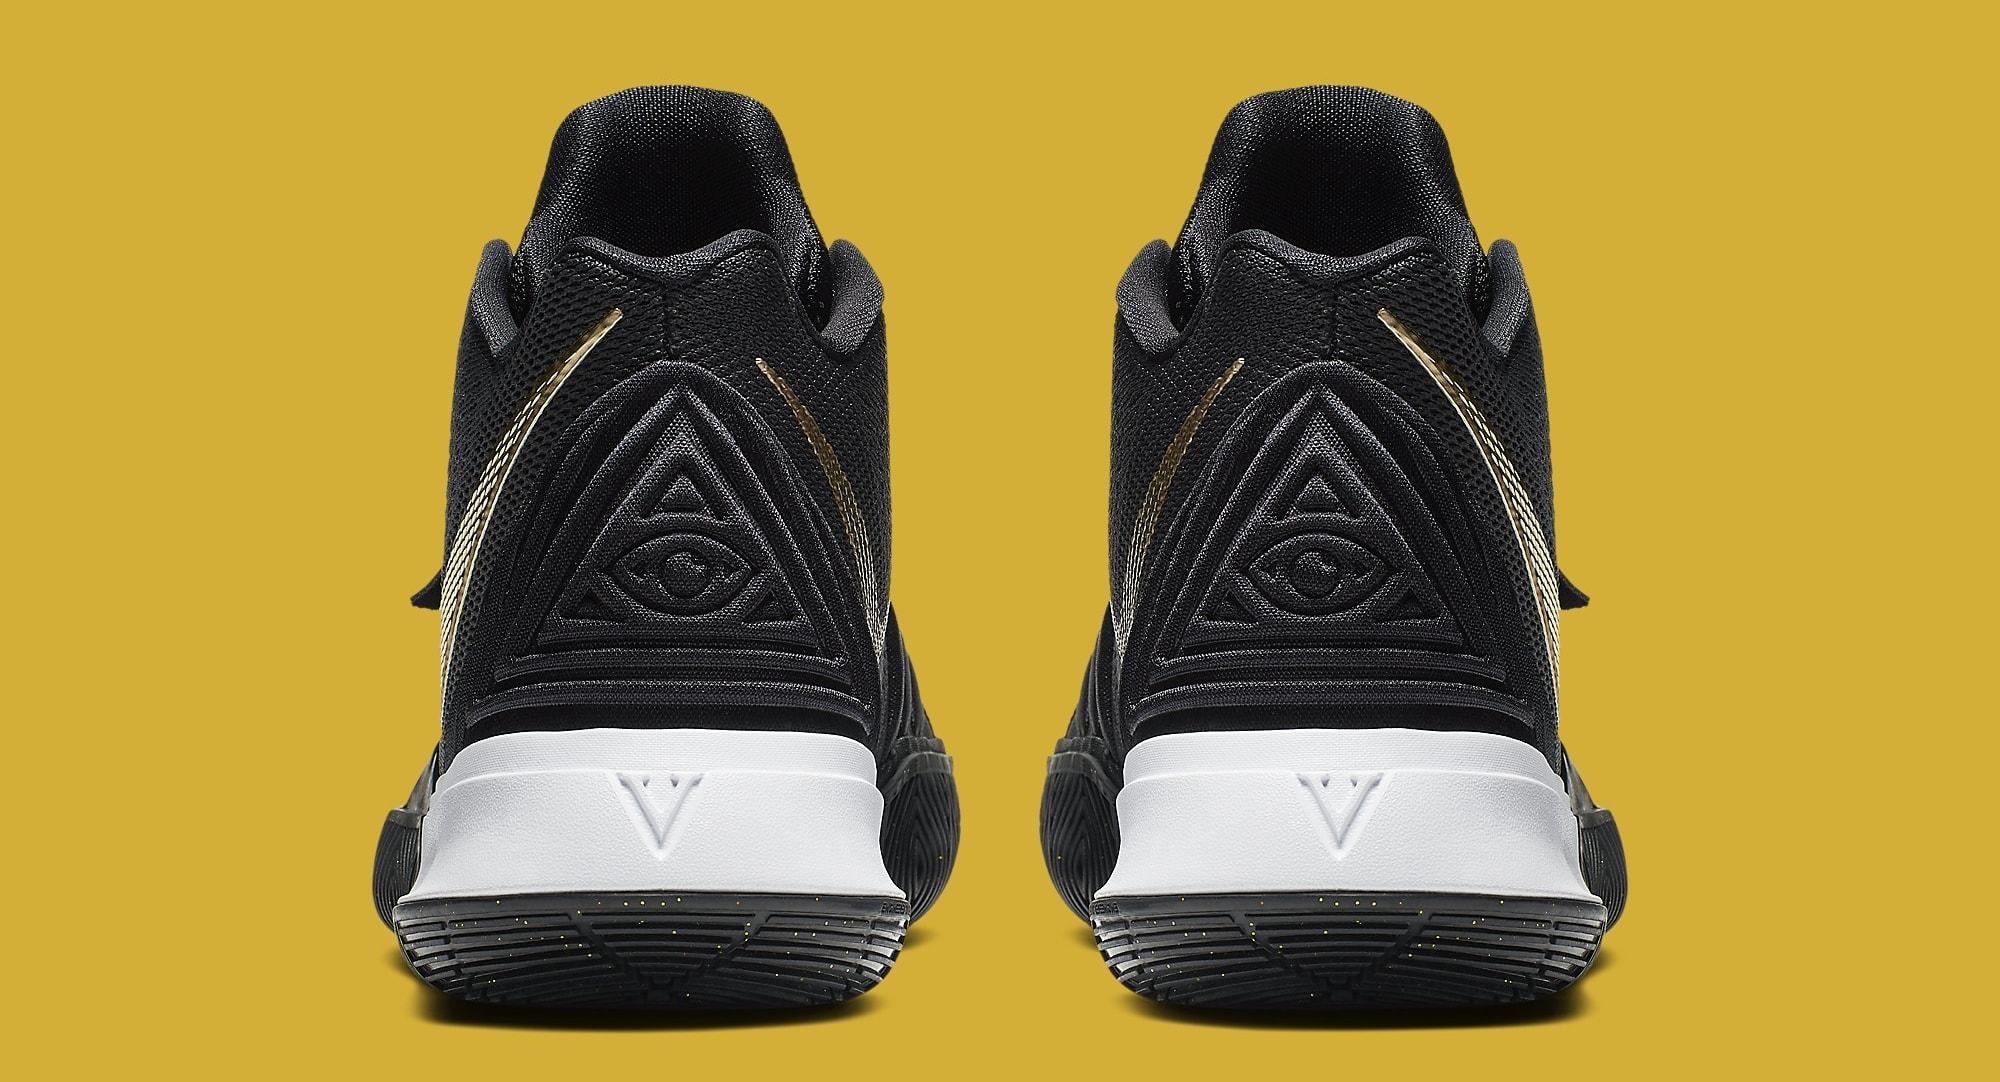 Nike Kyrie 5 'Black/Gold' AO2918-007 Heel